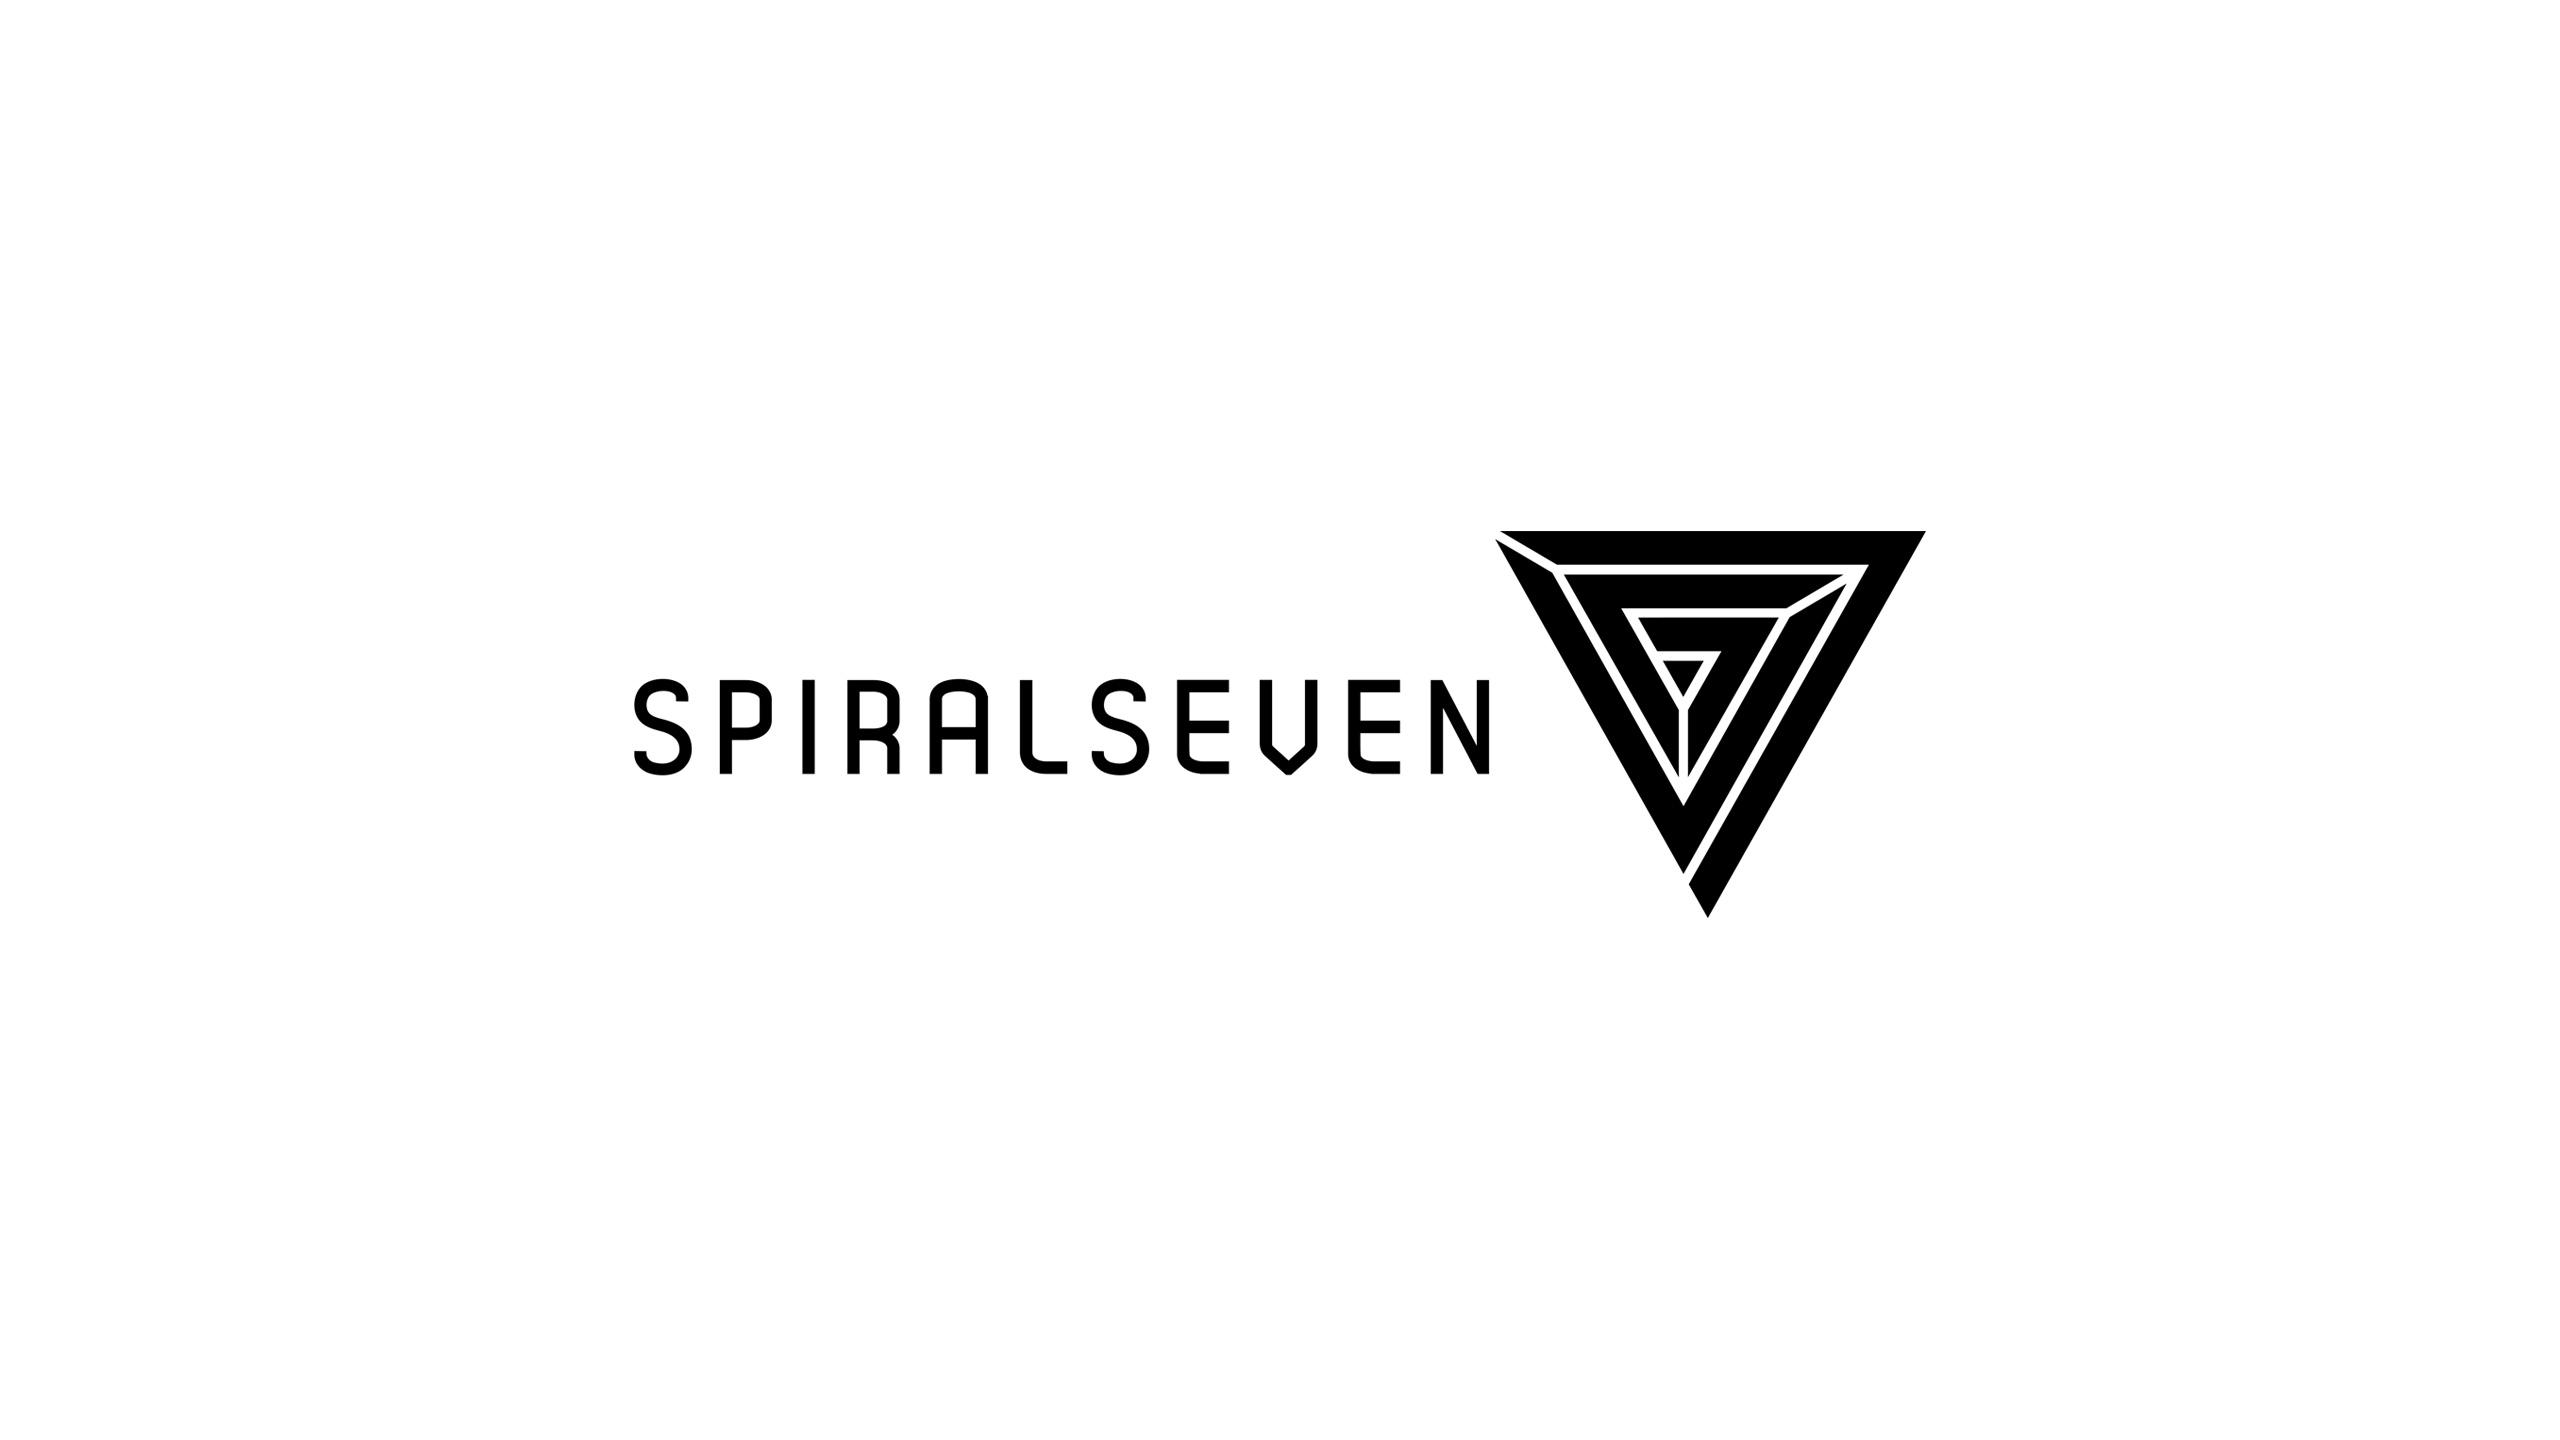 Read Spiralseven Clothing  Reviews